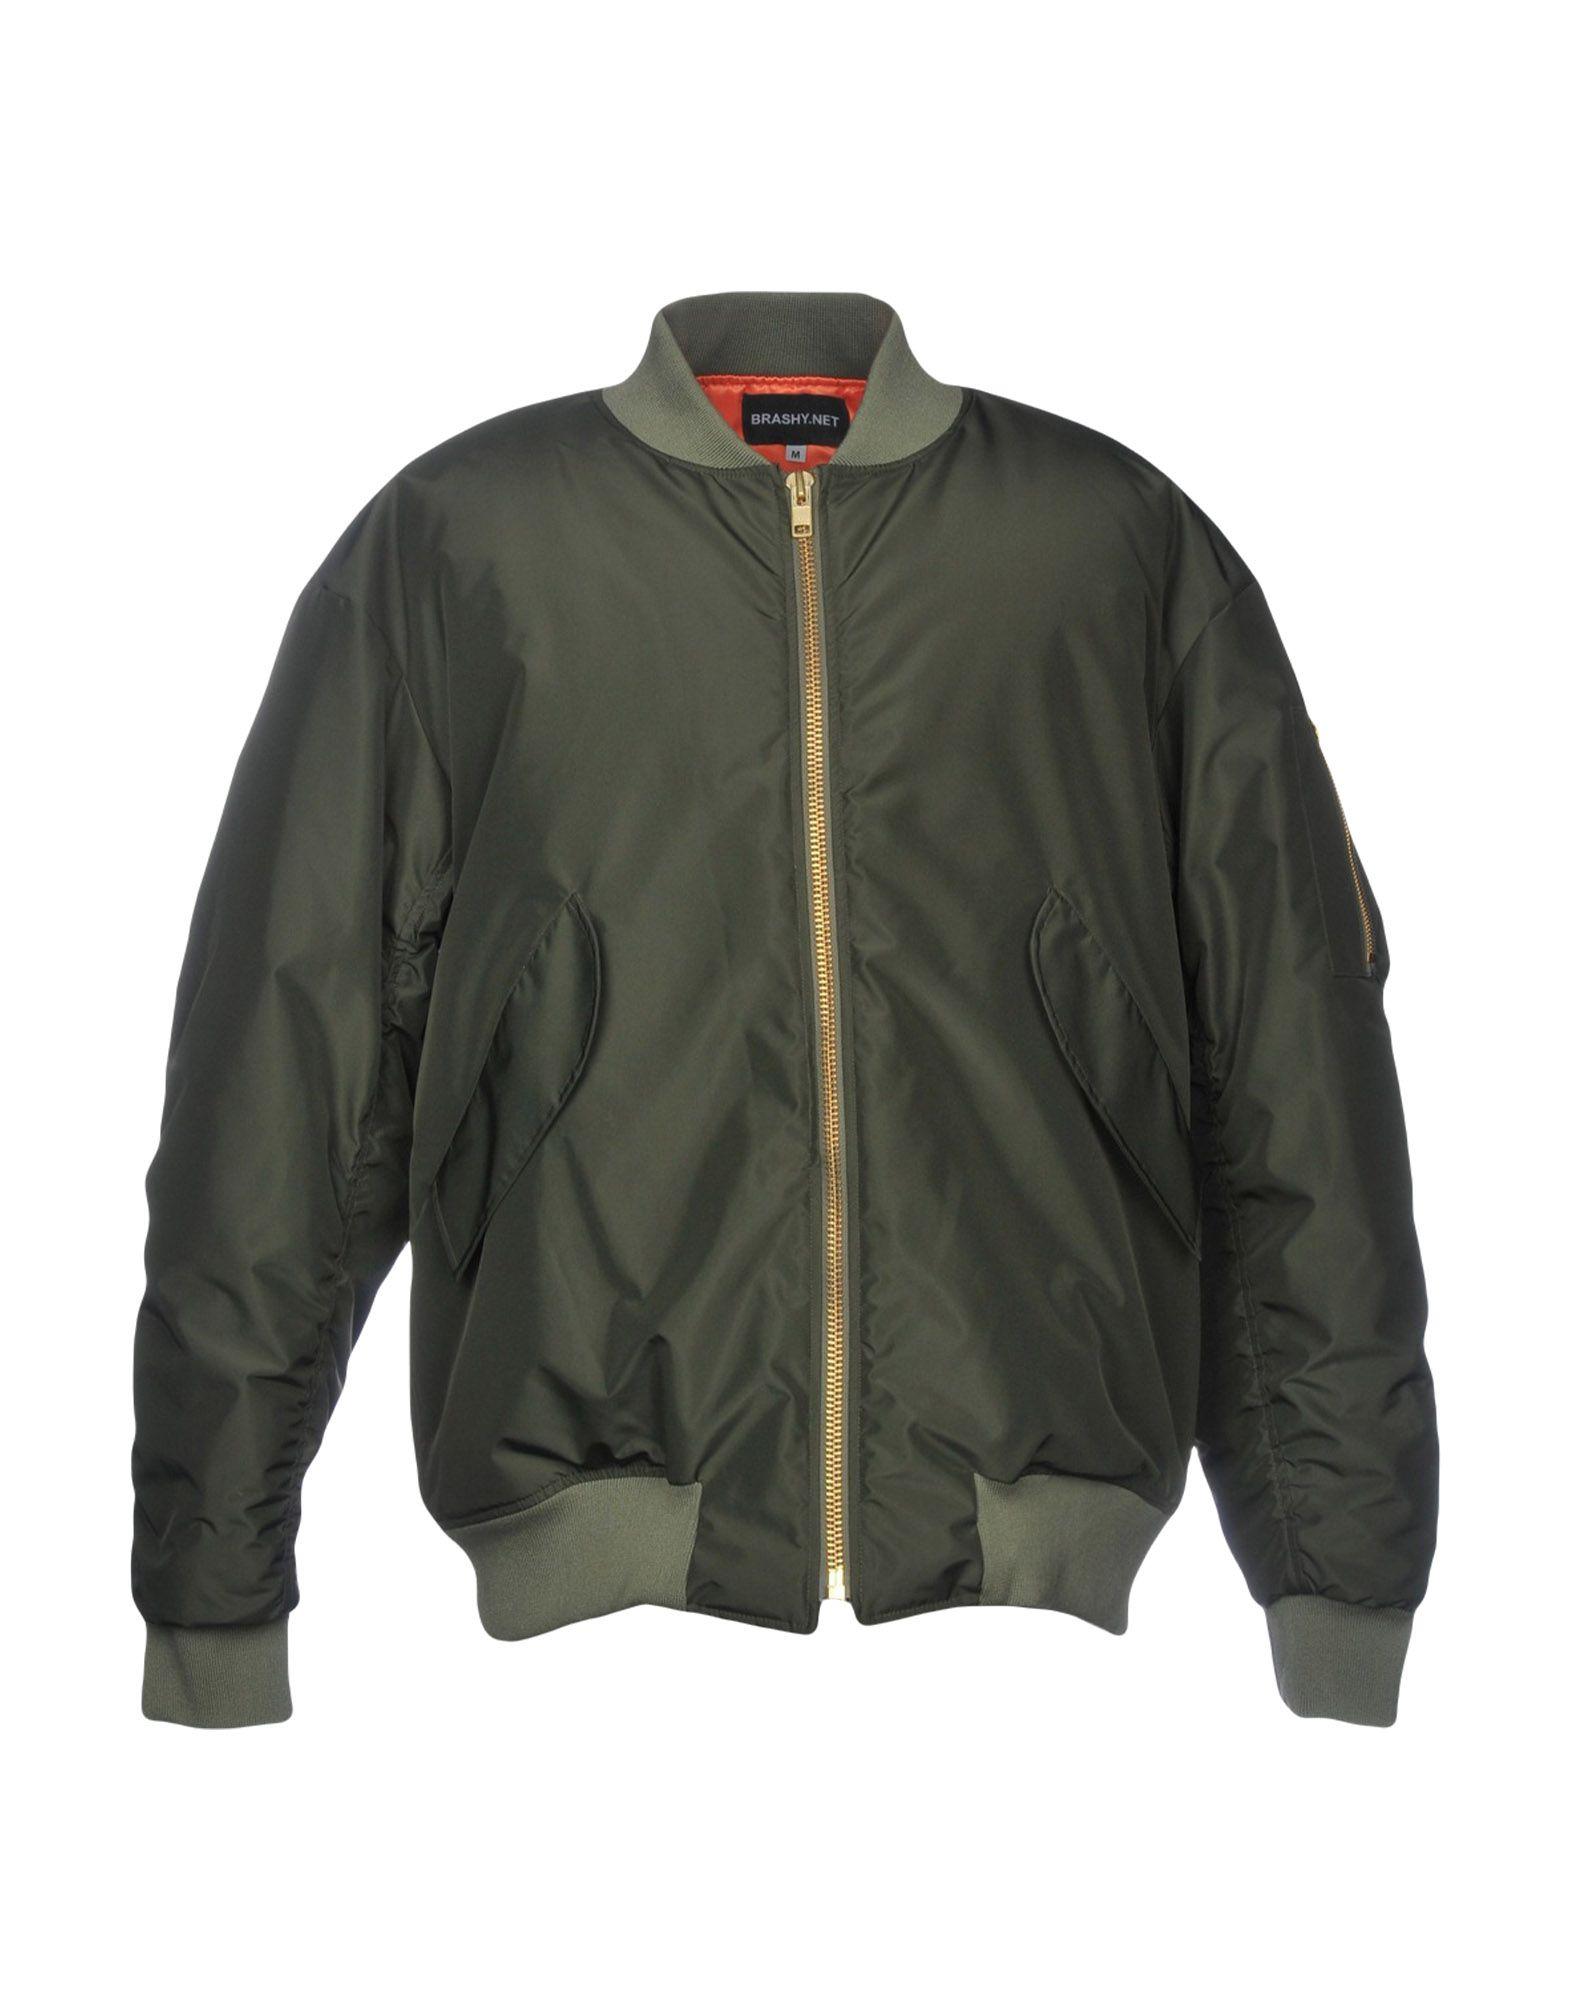 BRASHY Jackets in Military Green